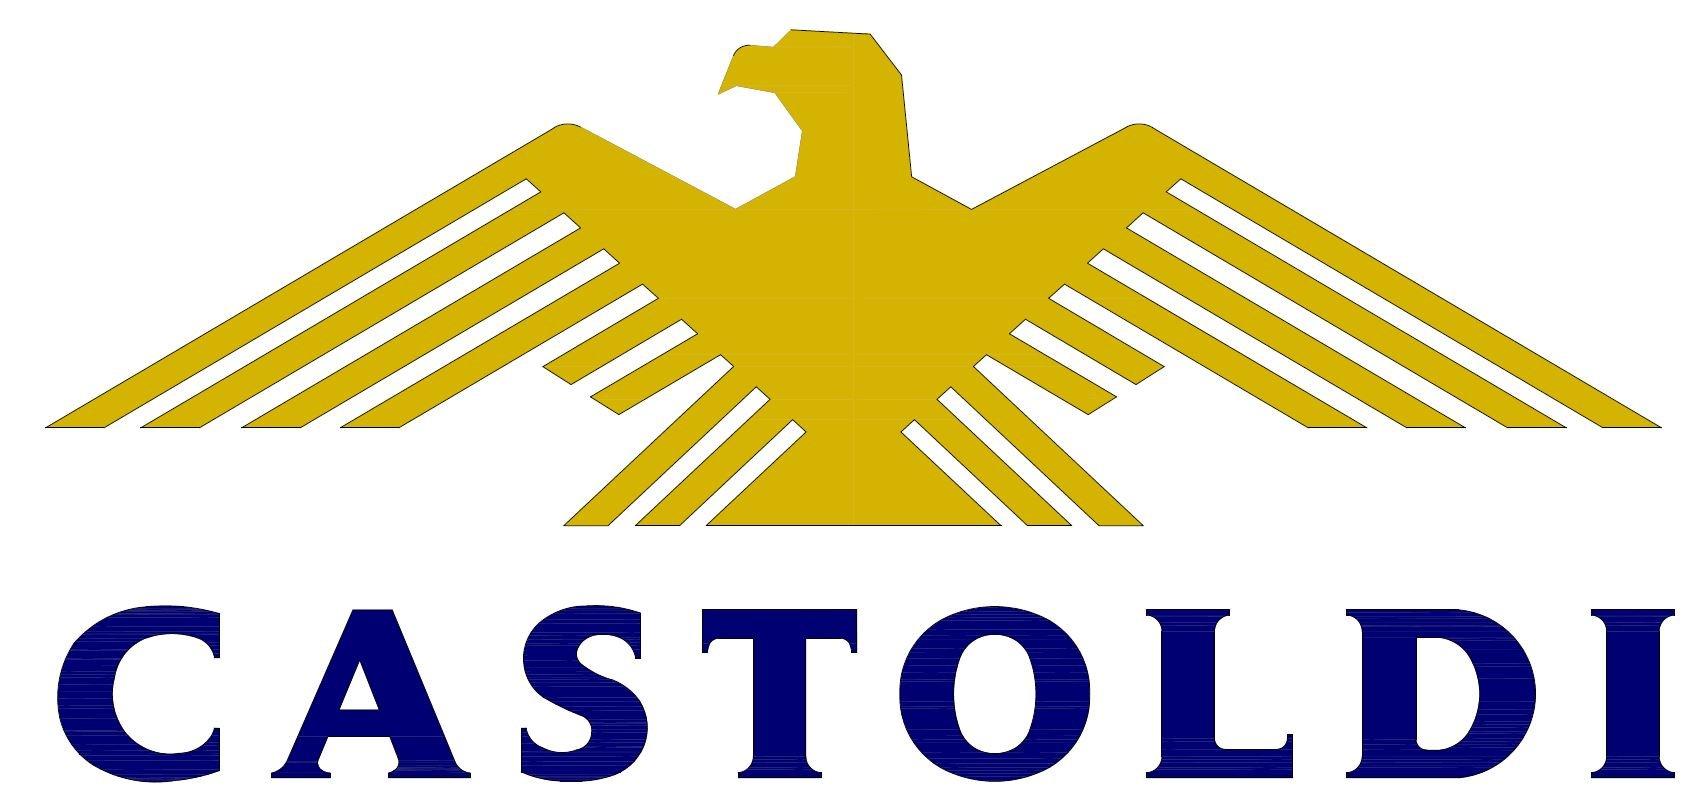 Castoldi logo